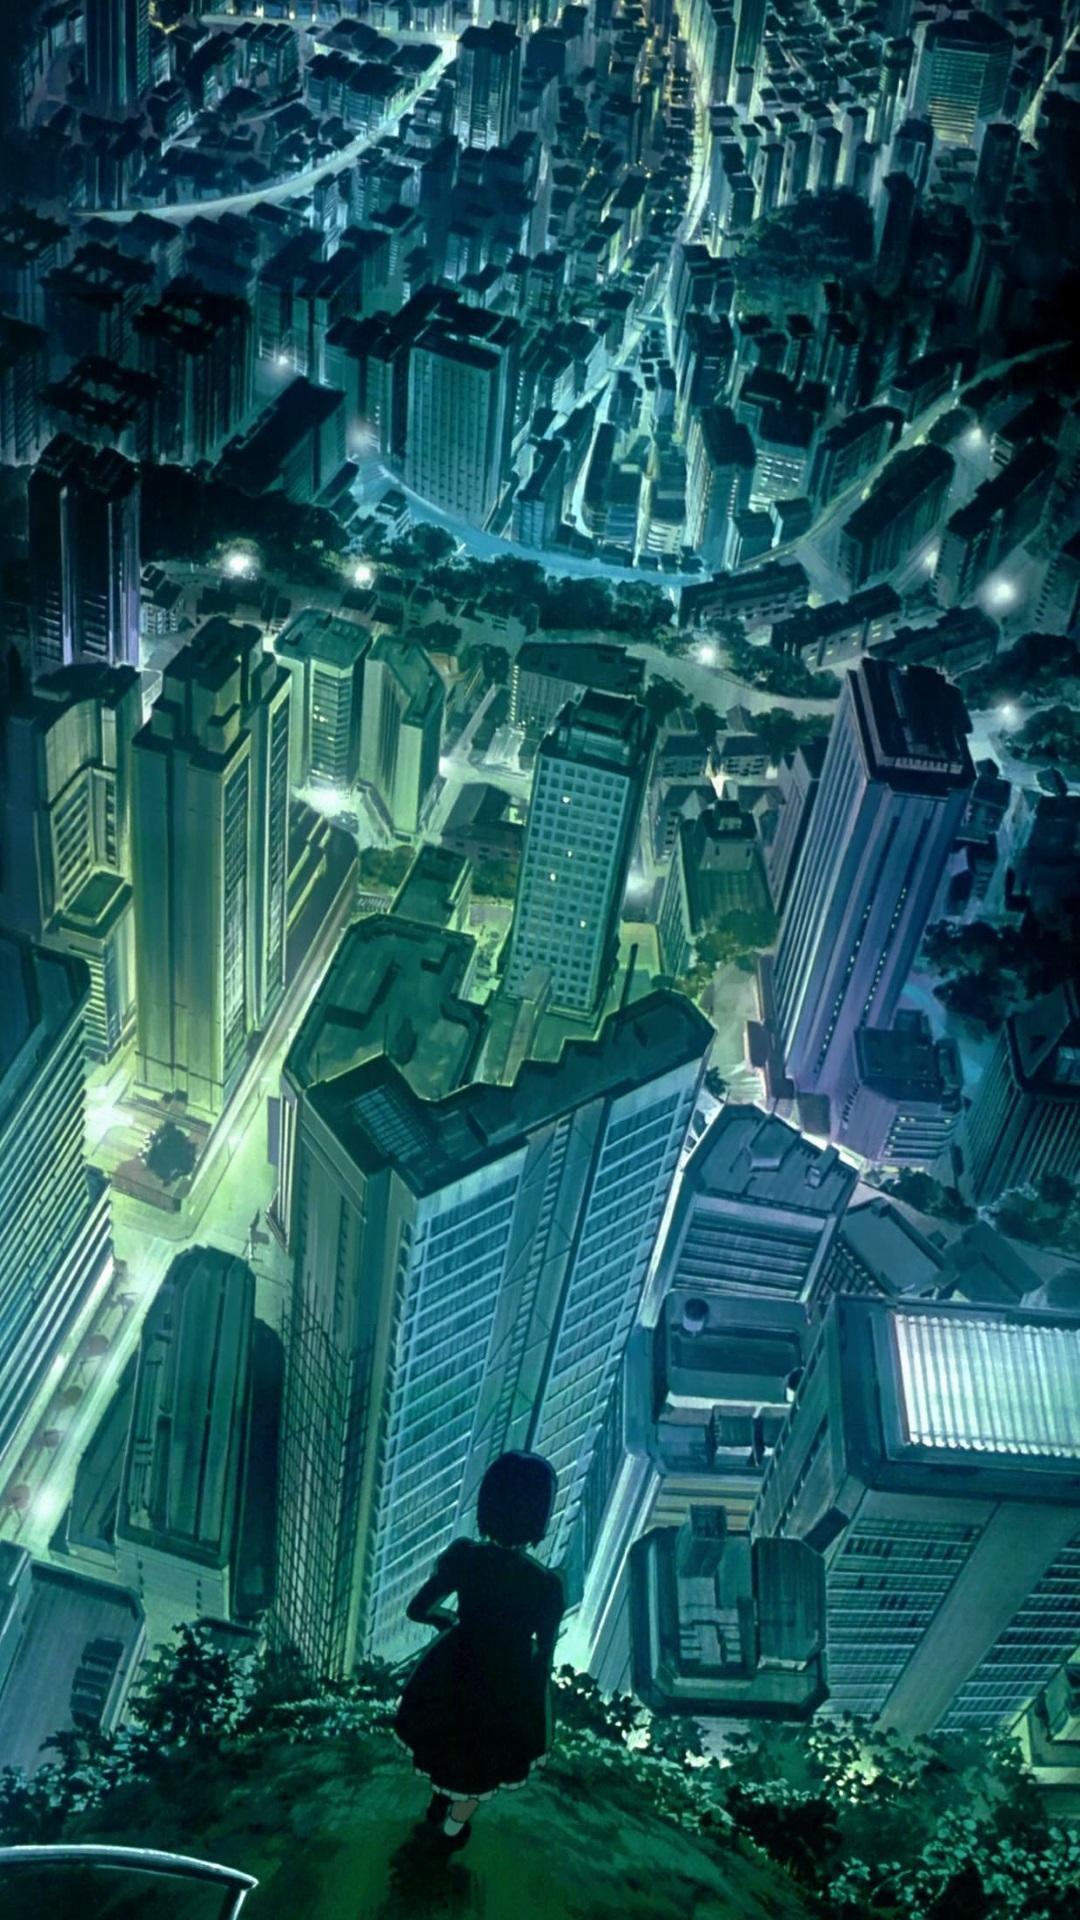 wallpaper.wiki-Supernatural-Iphone-Wallpaper-Download-PIC-WPD005010